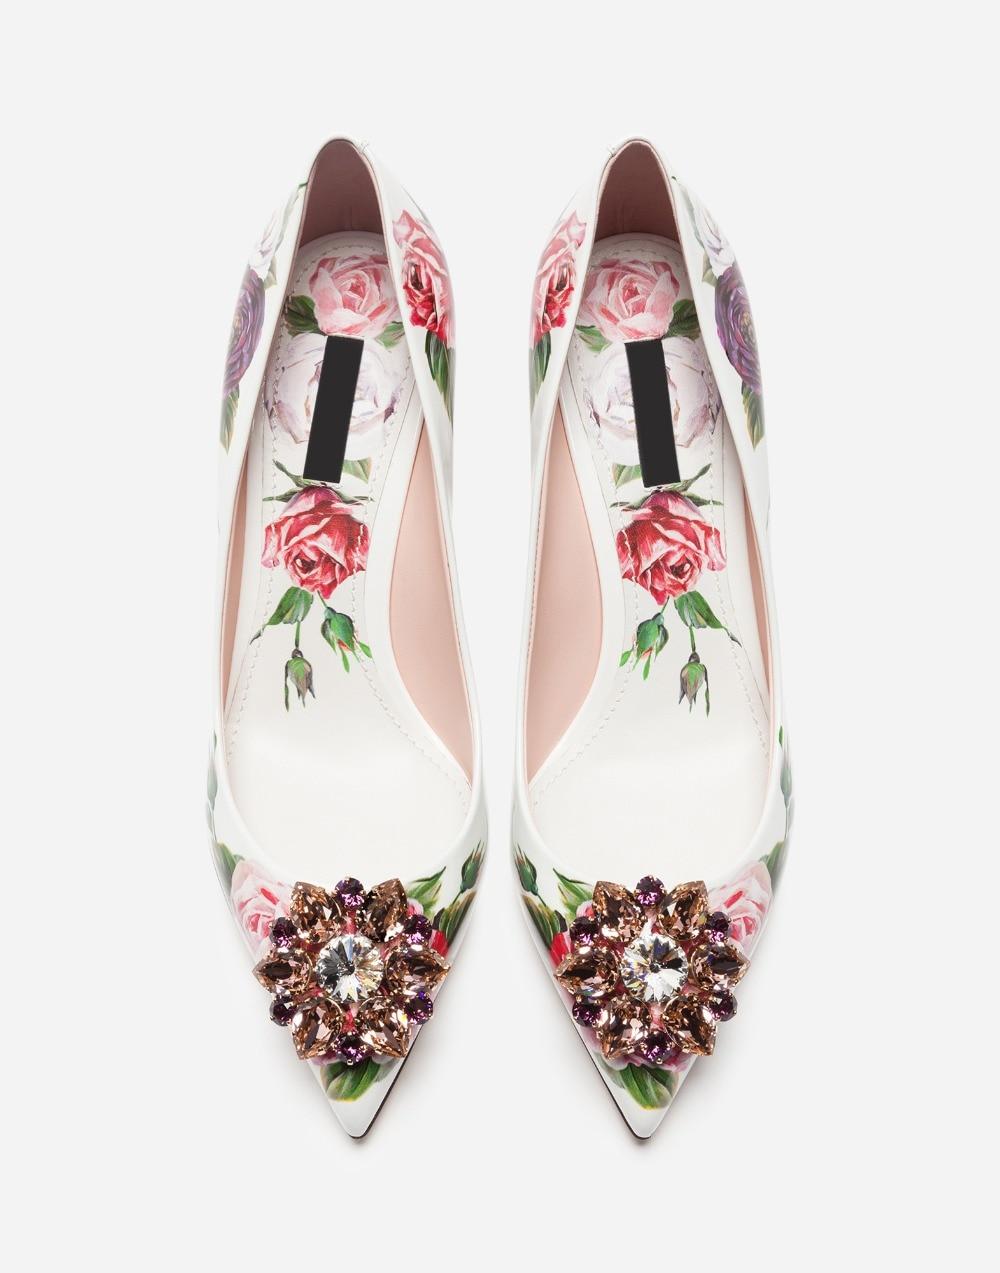 Luxury flower woman pumps diamonds 5CM low heel woman shoes pointed toe  flower Stiletto High Heel Rhinestone Bling Wedding Shoes 550744d90ed6